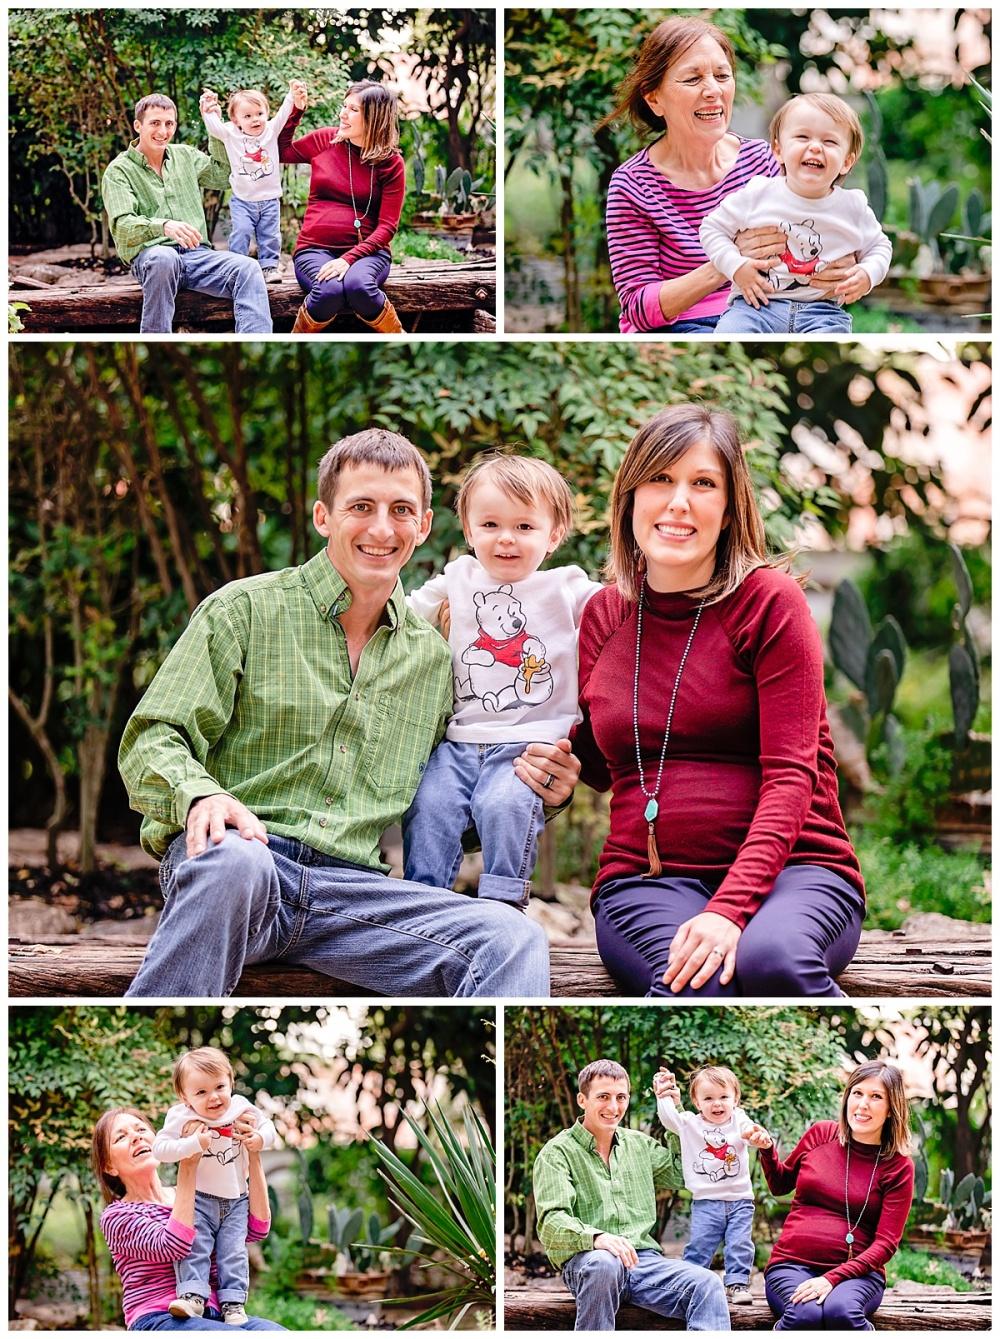 Family-Photographer-Gruene-Texas-Fall-Carly-Barton-Photography_0003.jpg